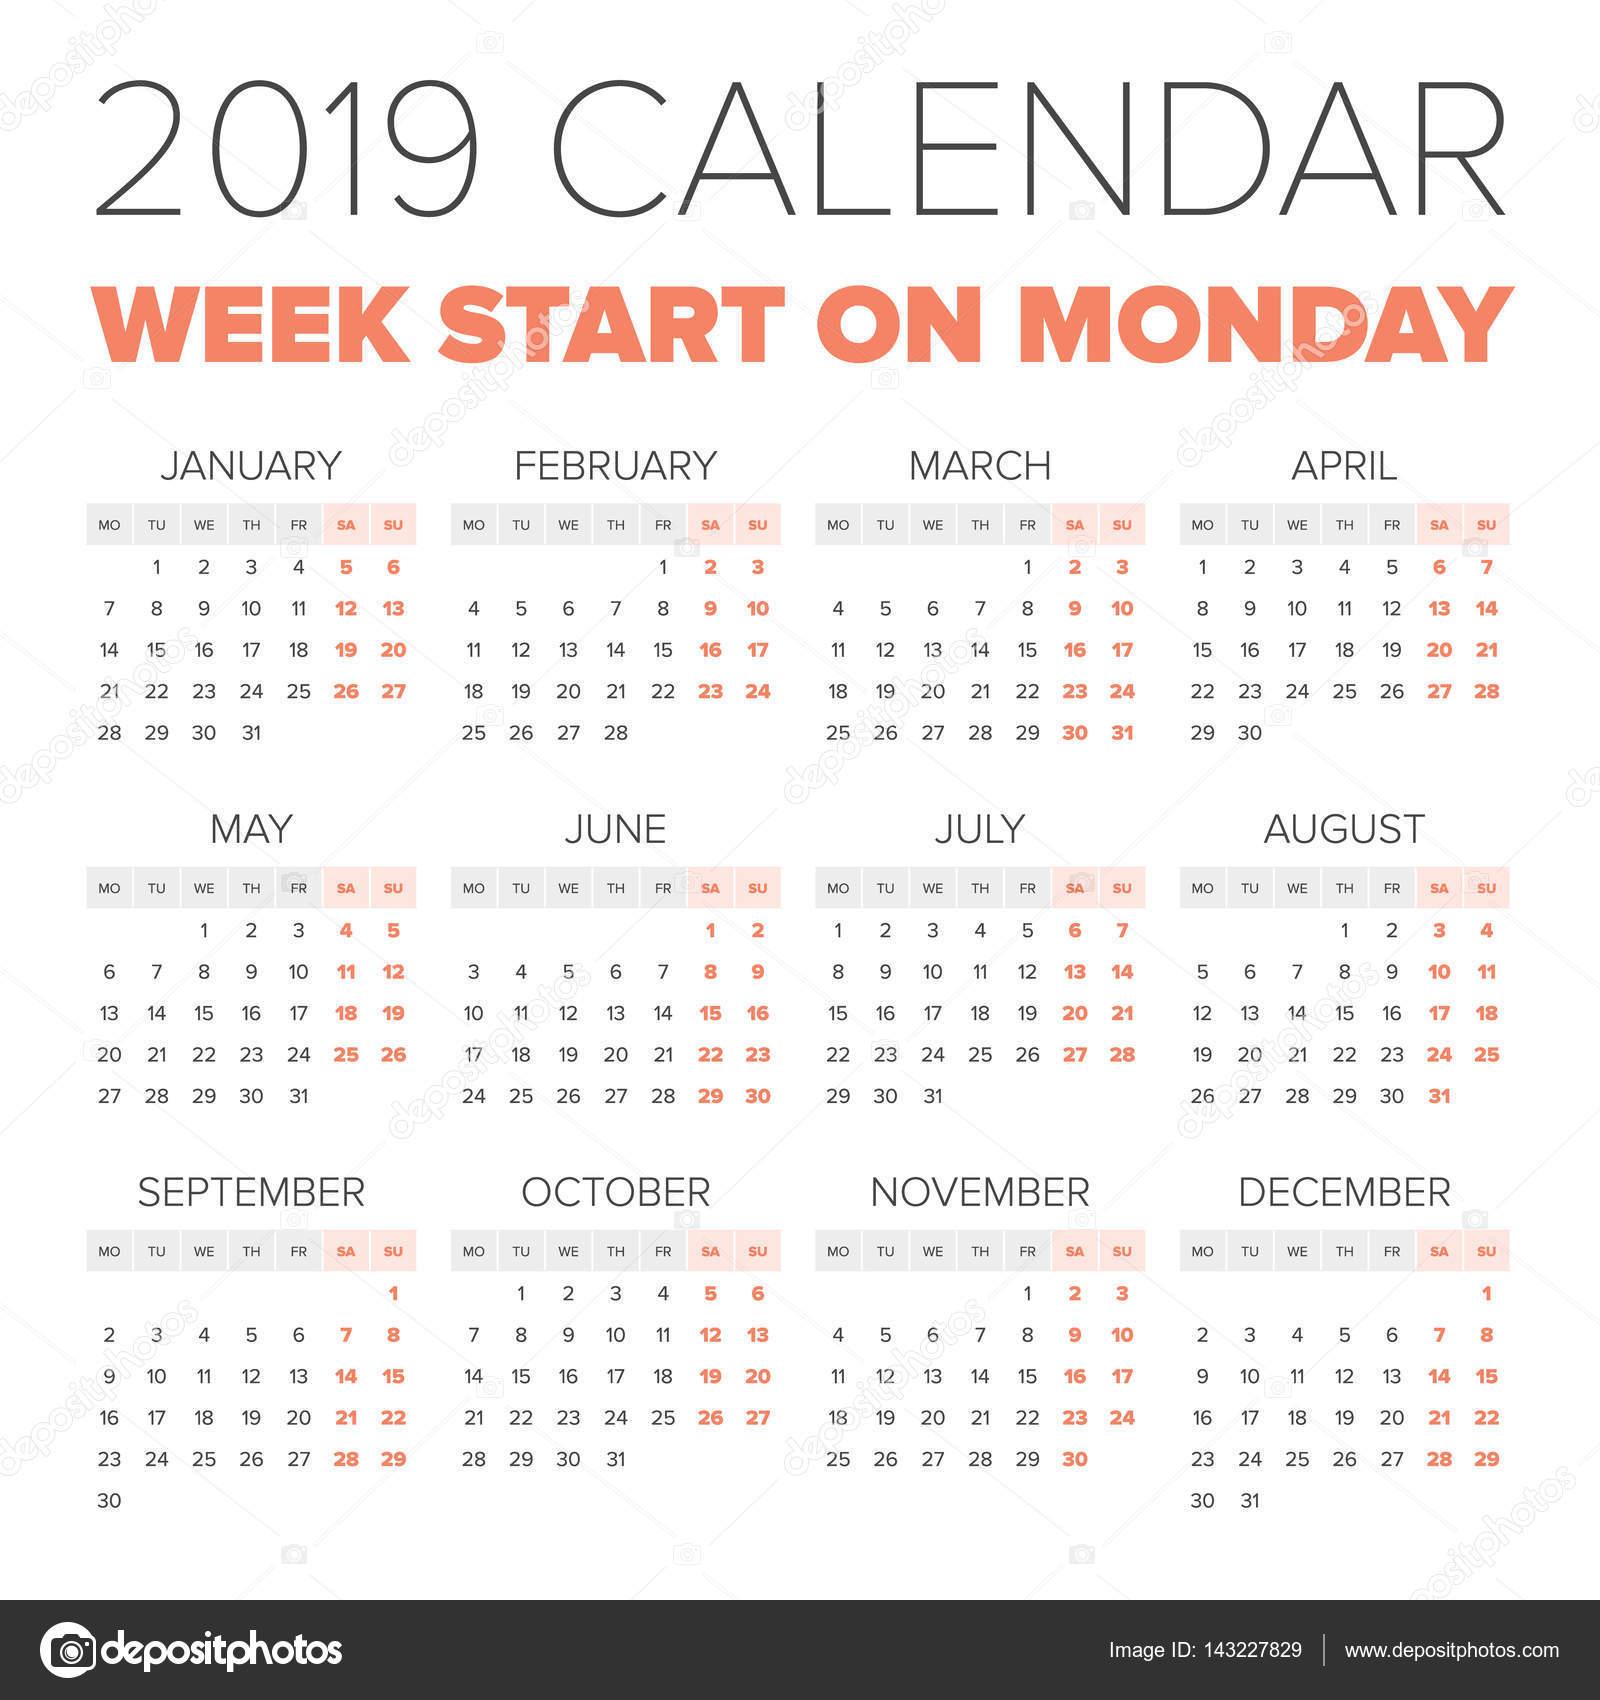 1 2019 calendar